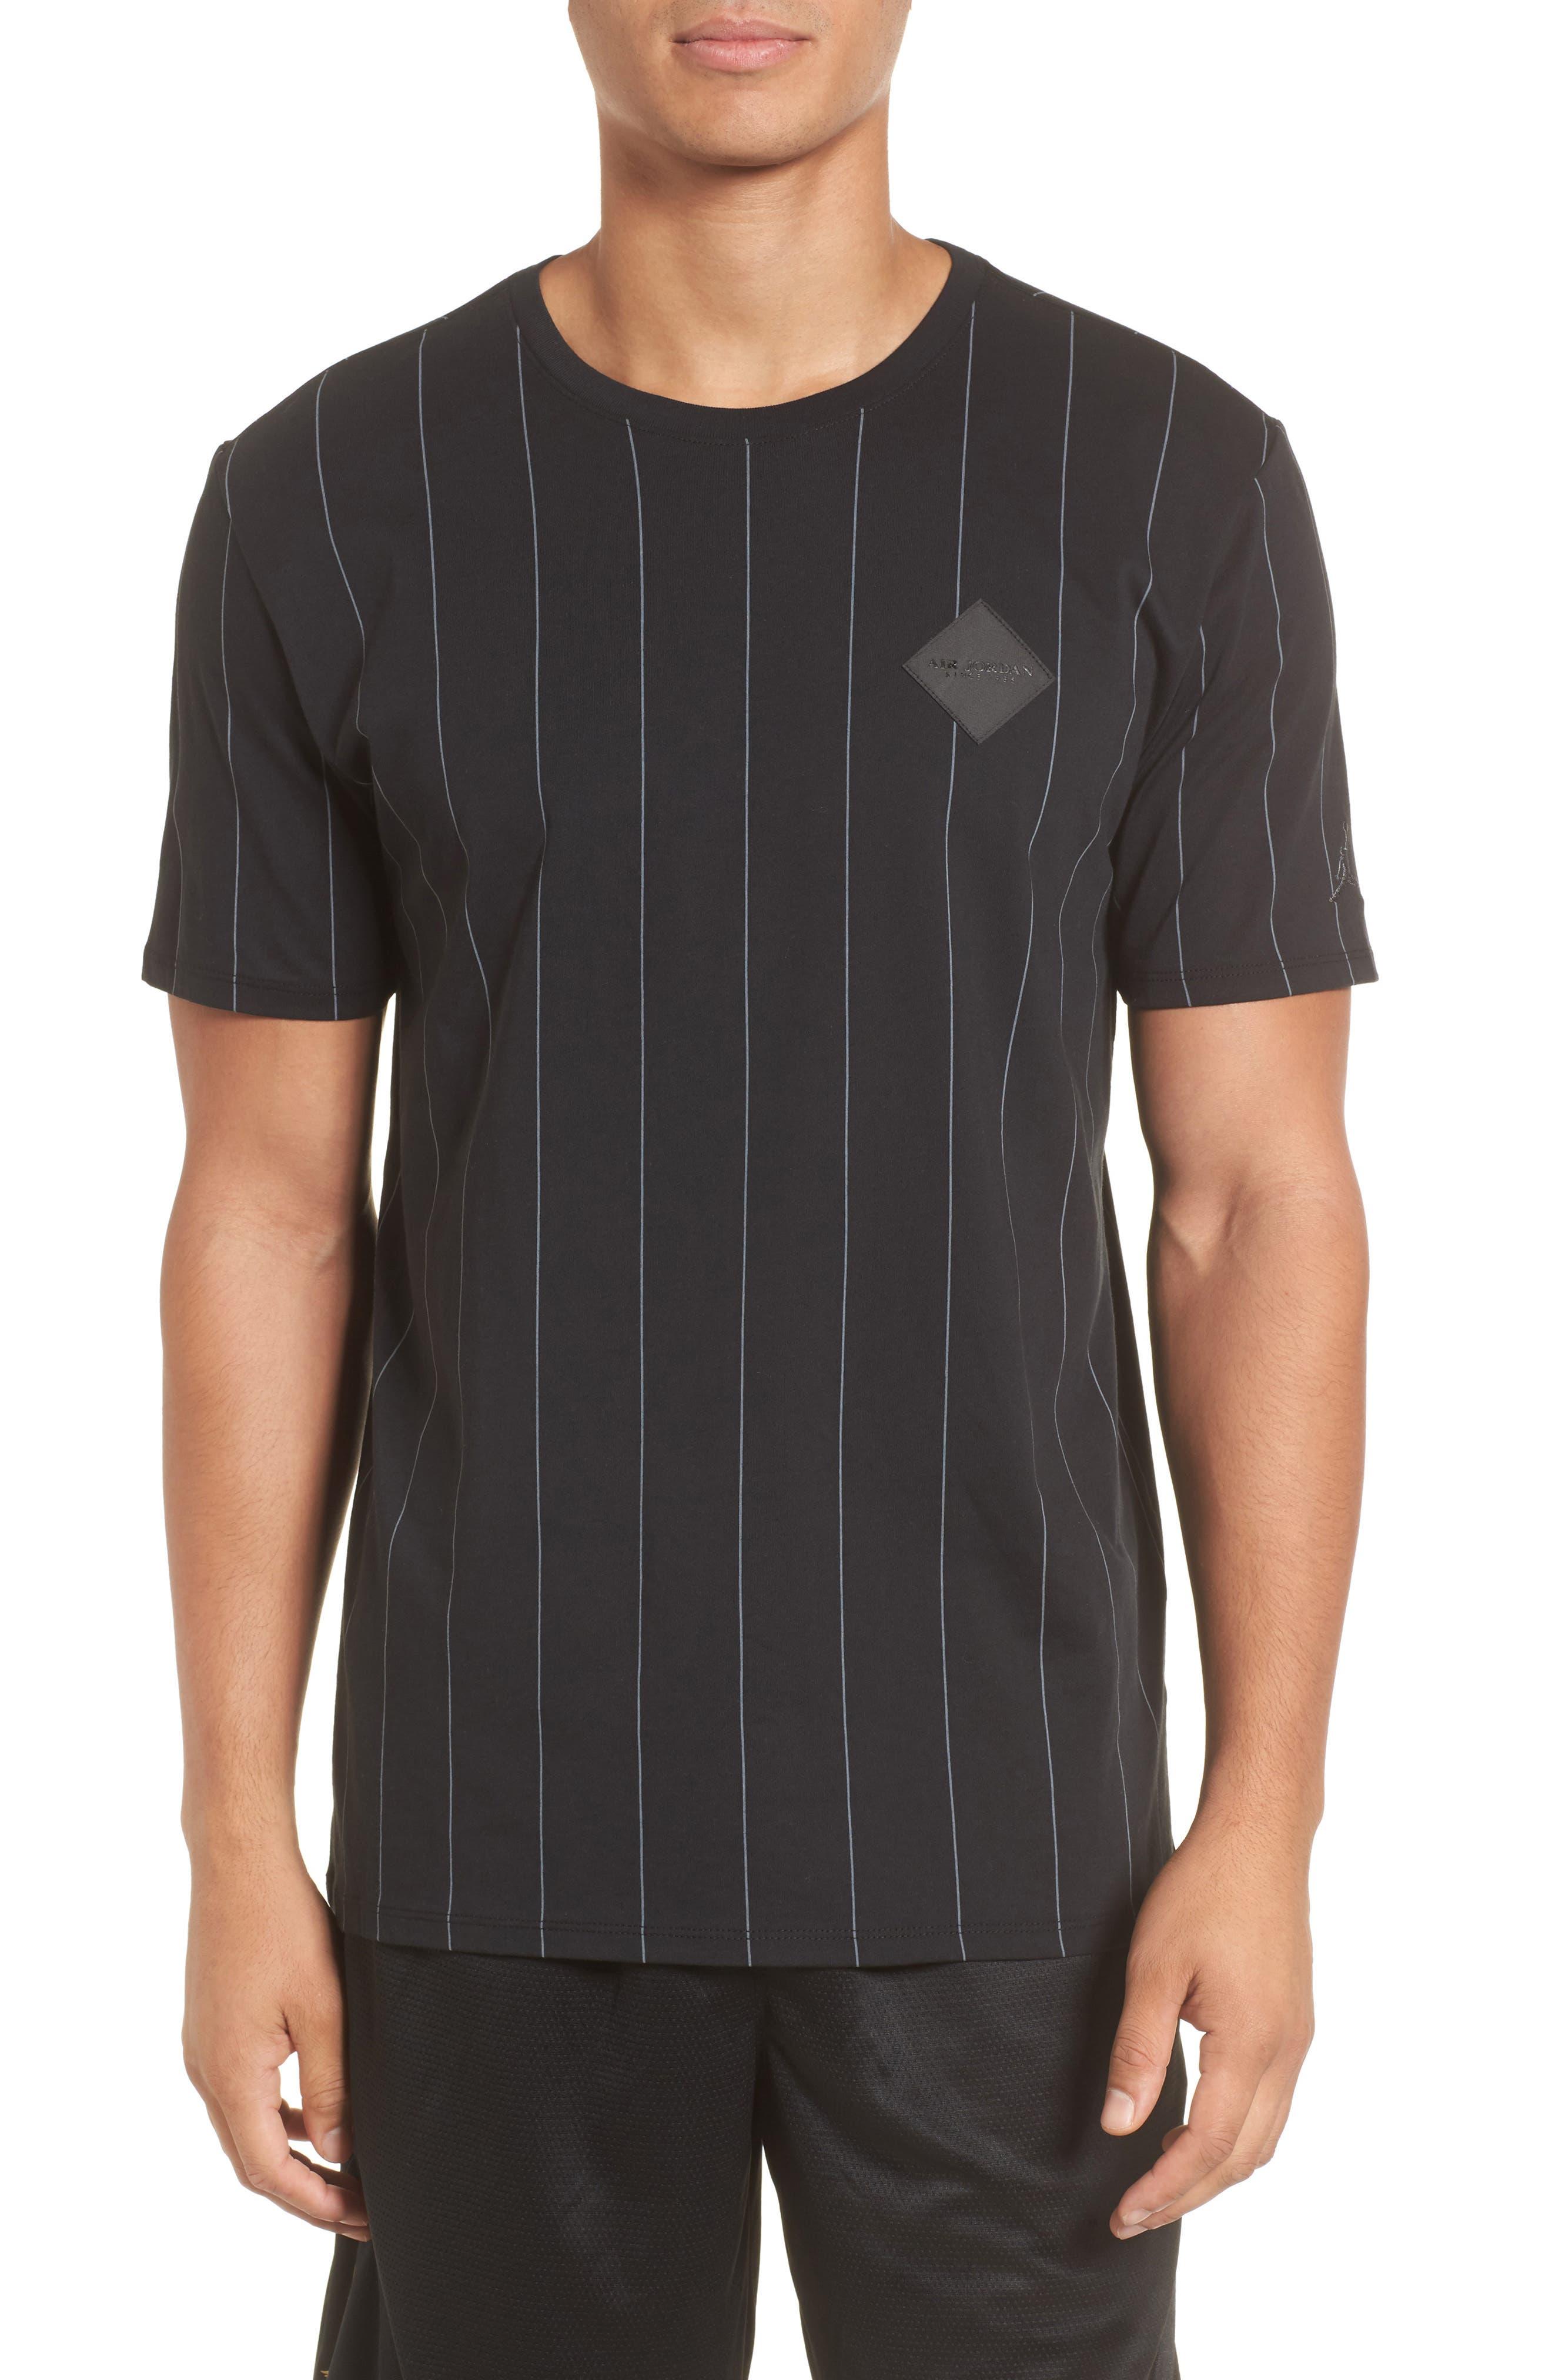 Sportswear AJ 9 T-Shirt,                         Main,                         color, 010